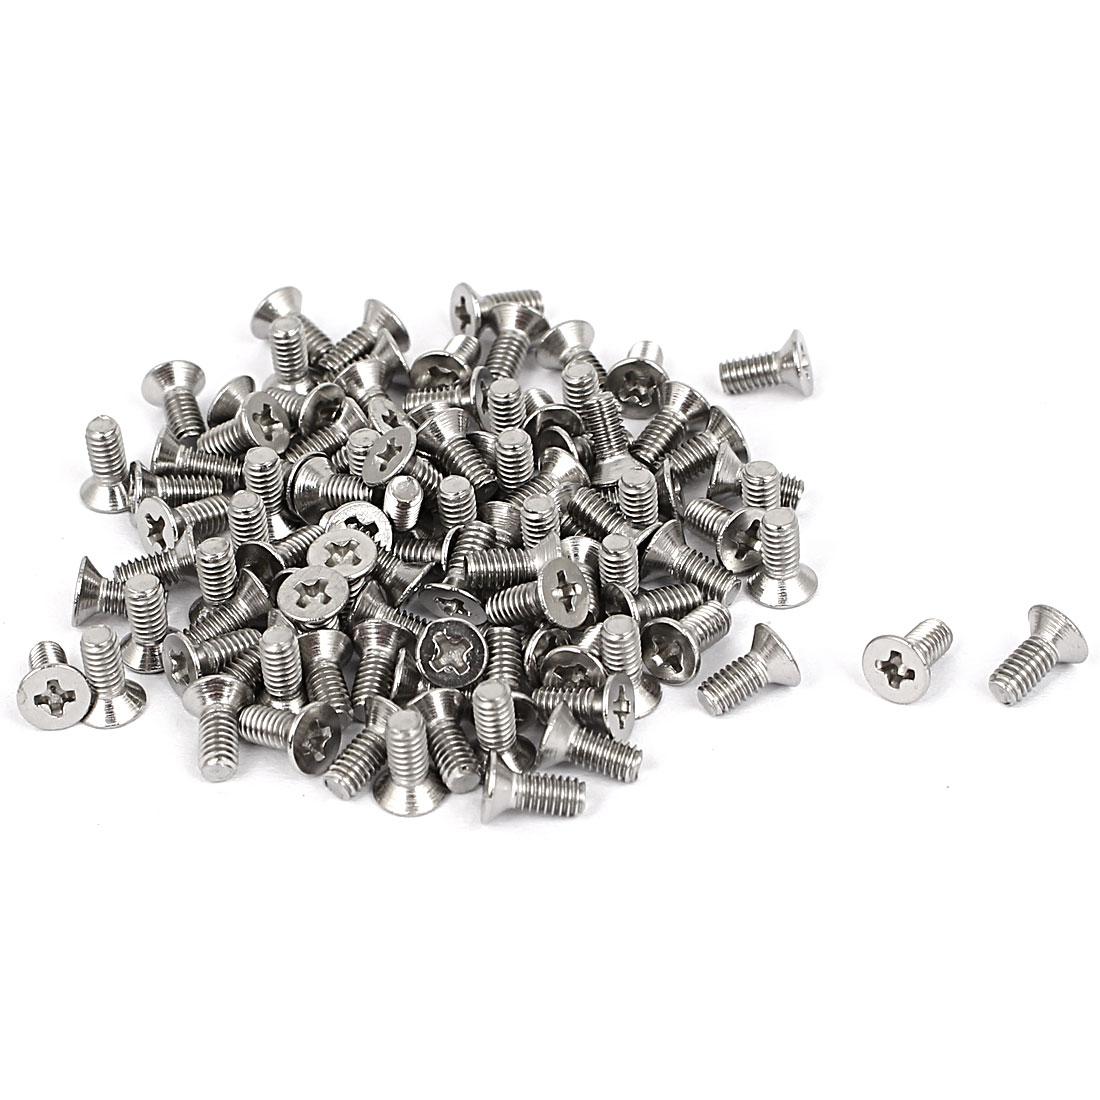 M2.5x6mm Stainless Steel Phillips Flat Countersunk Head Screws 100pcs